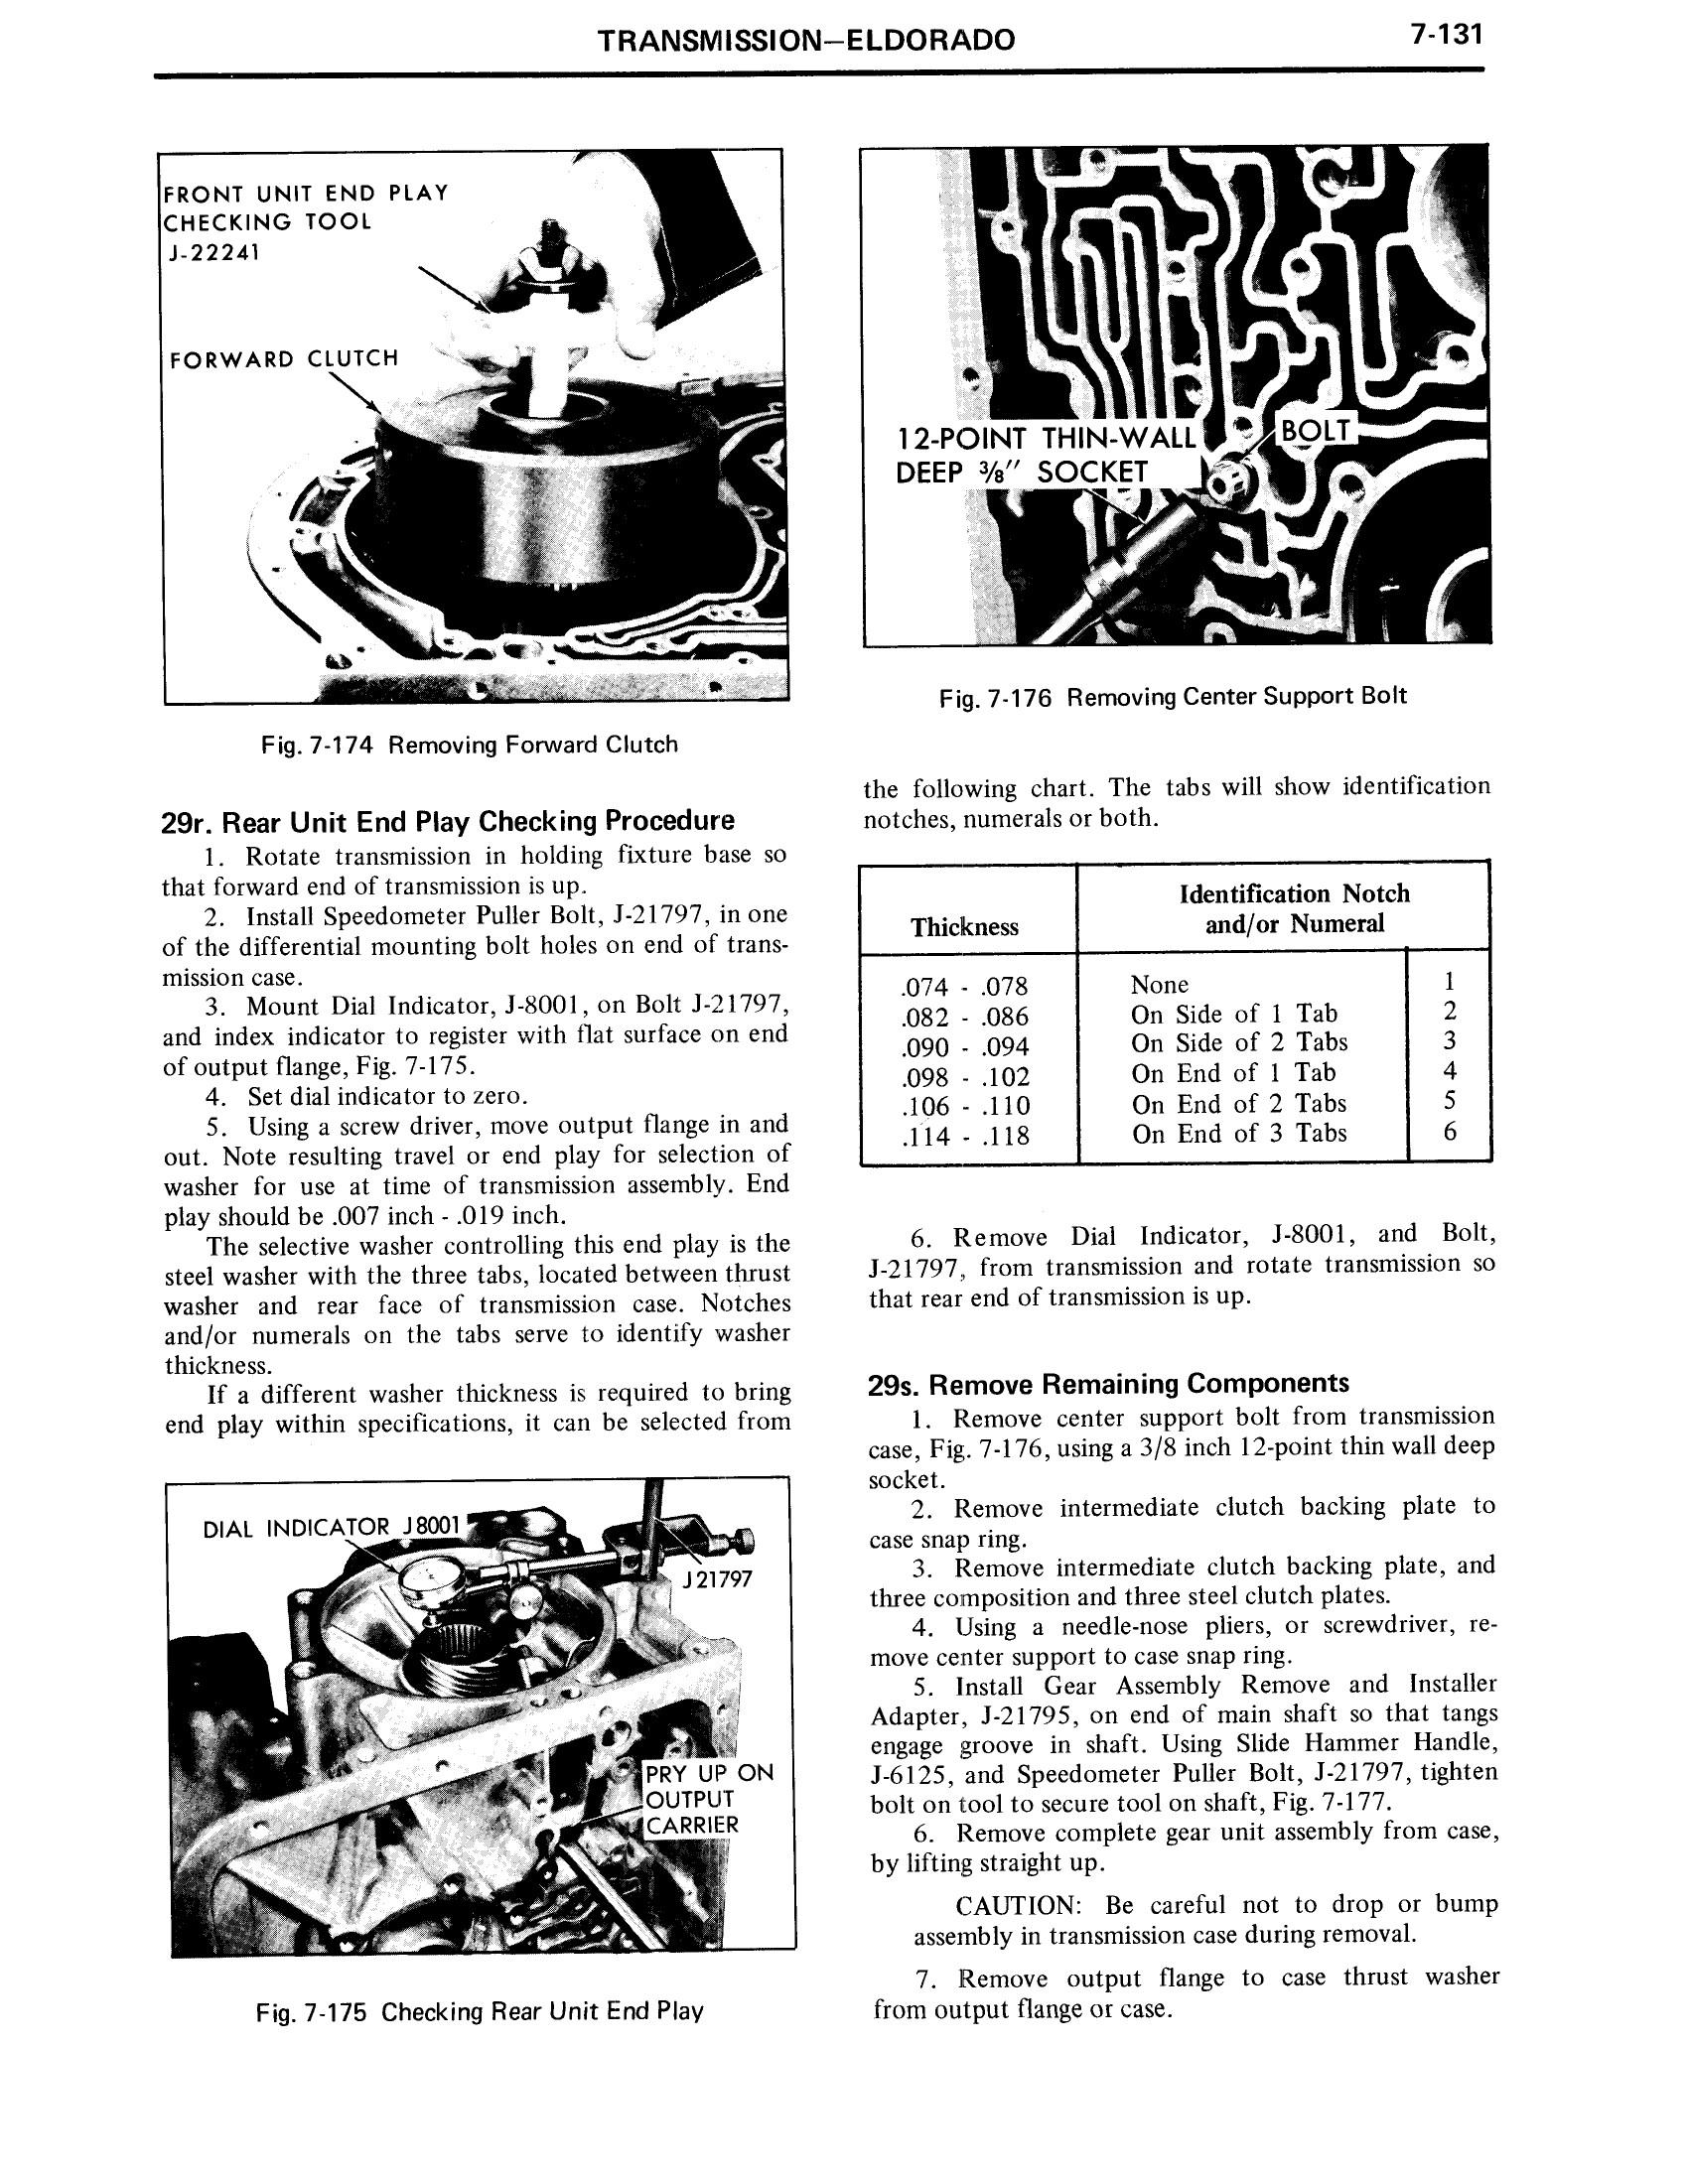 1971 Cadillac Shop Manual- Transmission Page 131 of 156